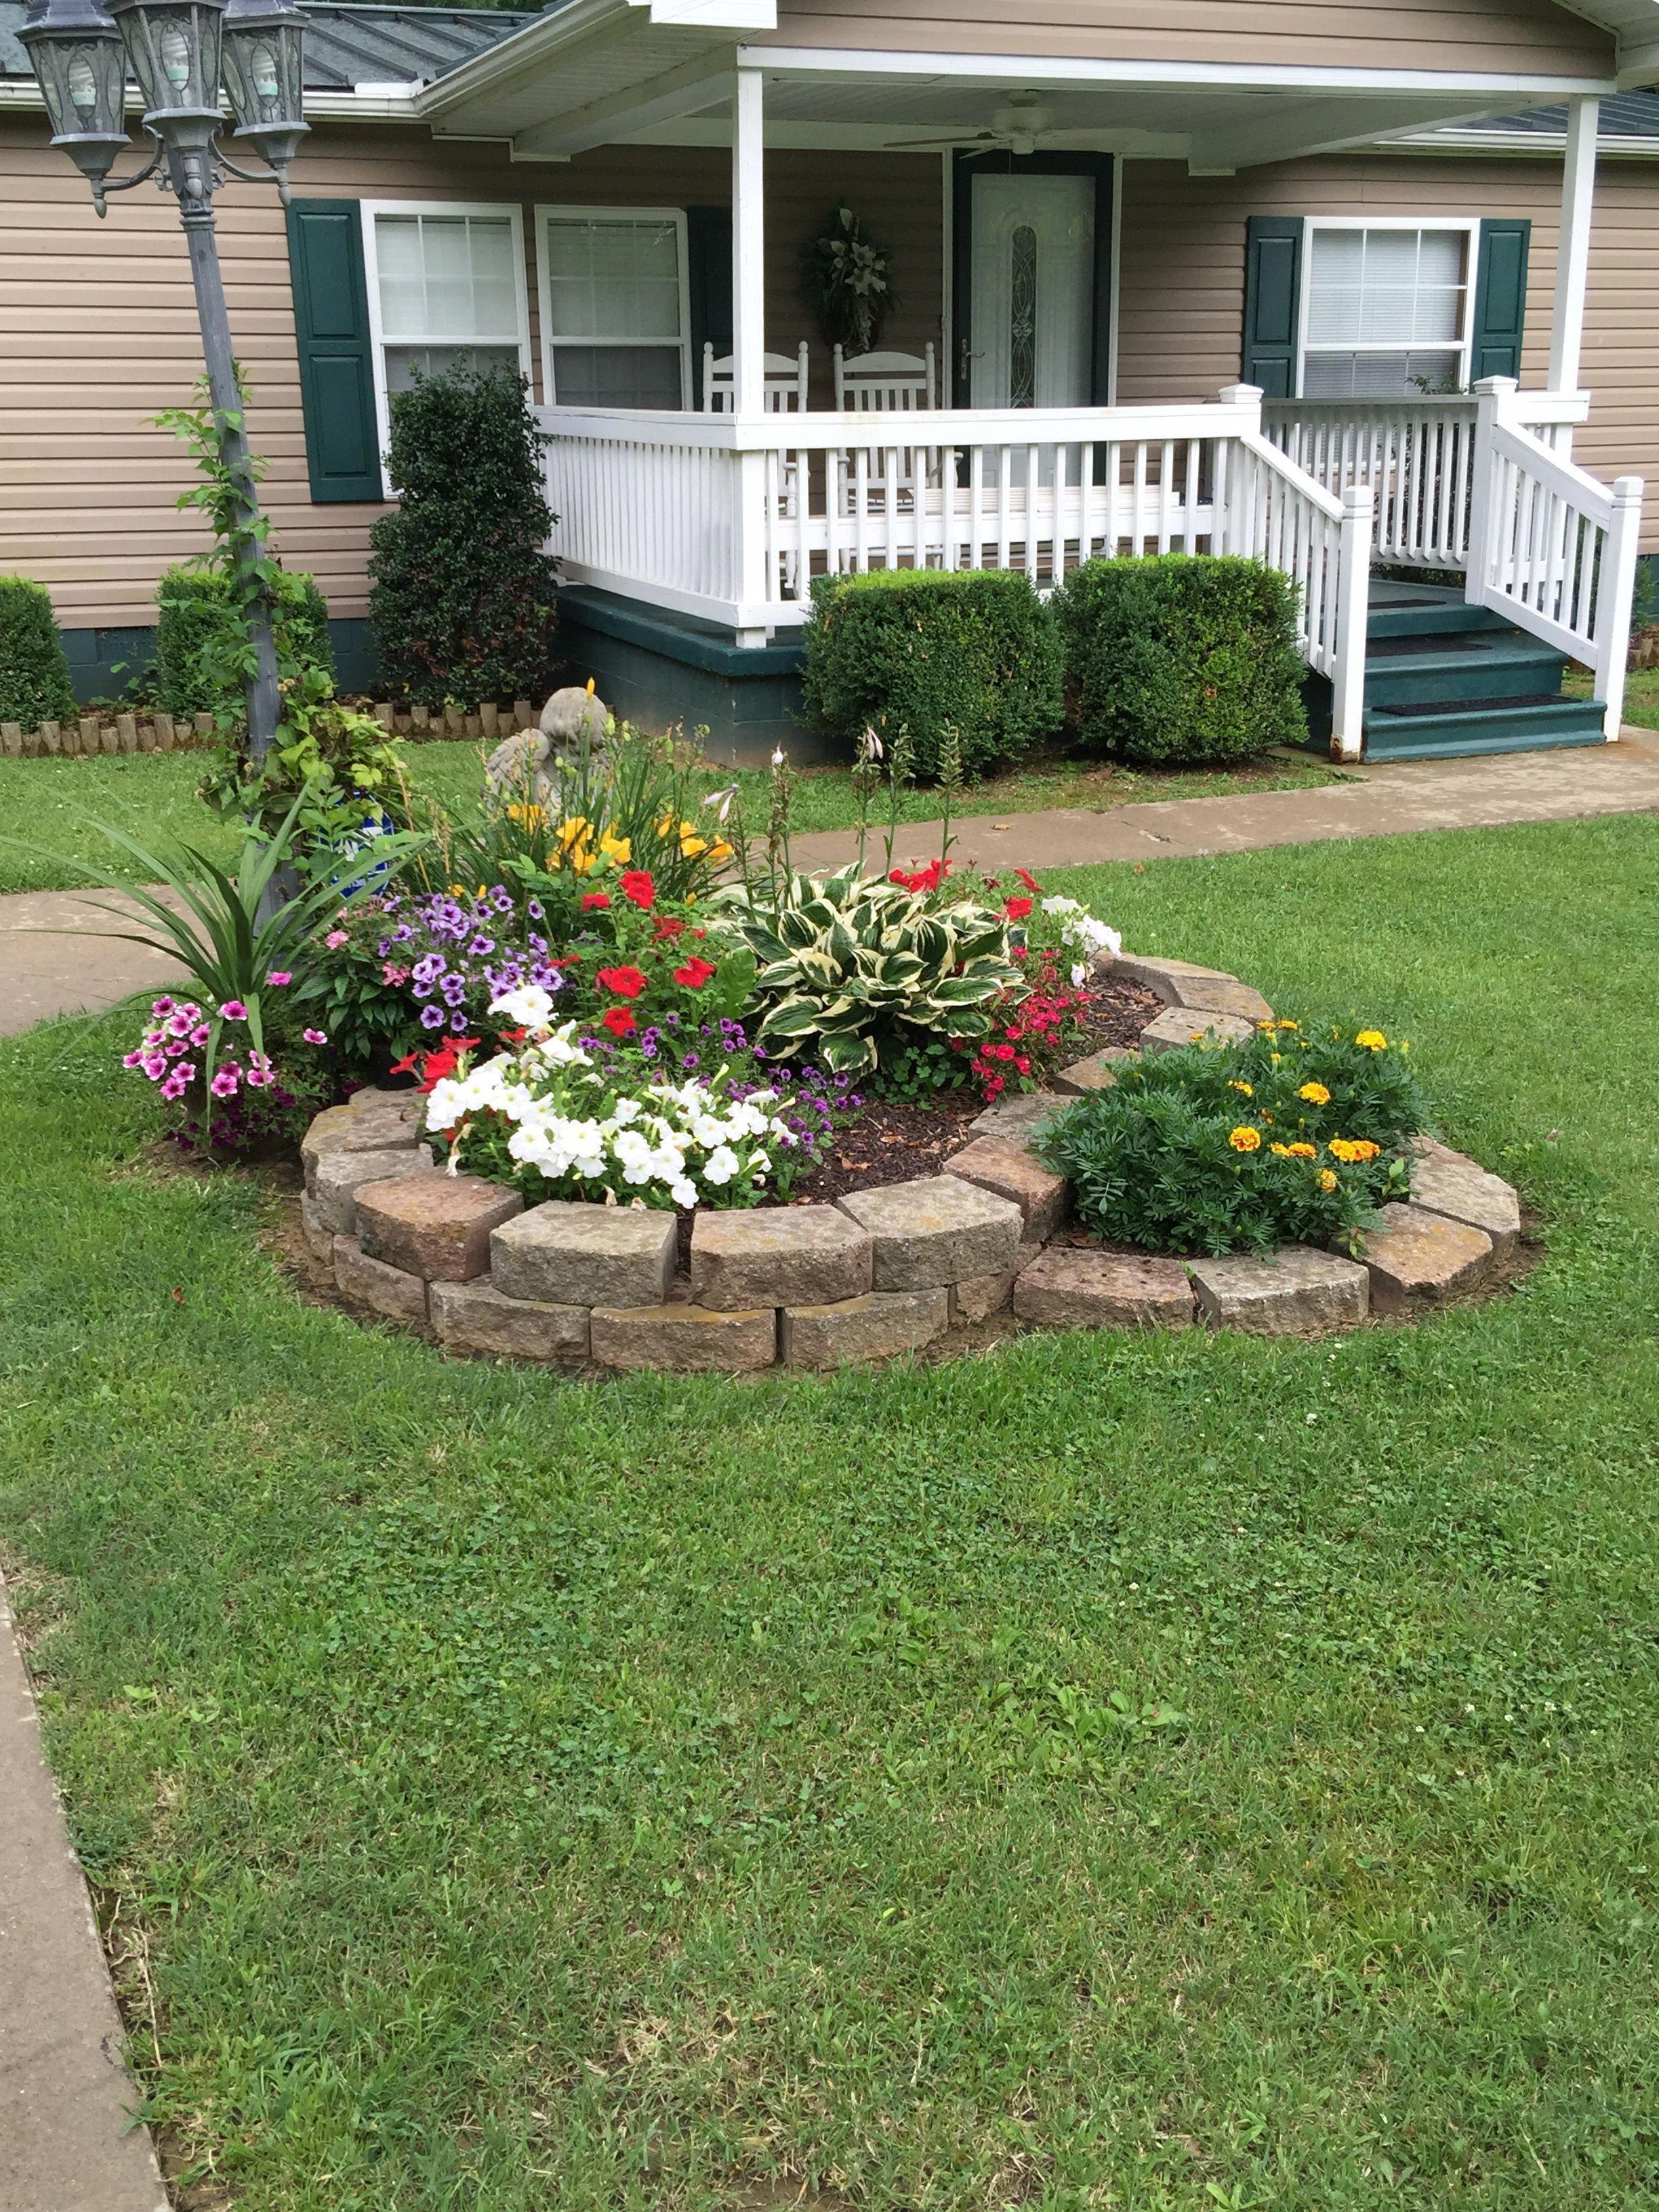 diy landscaping ideas 5592115018 beautifulgardenideas on inspiring trends front yard landscaping ideas minimal budget id=74521